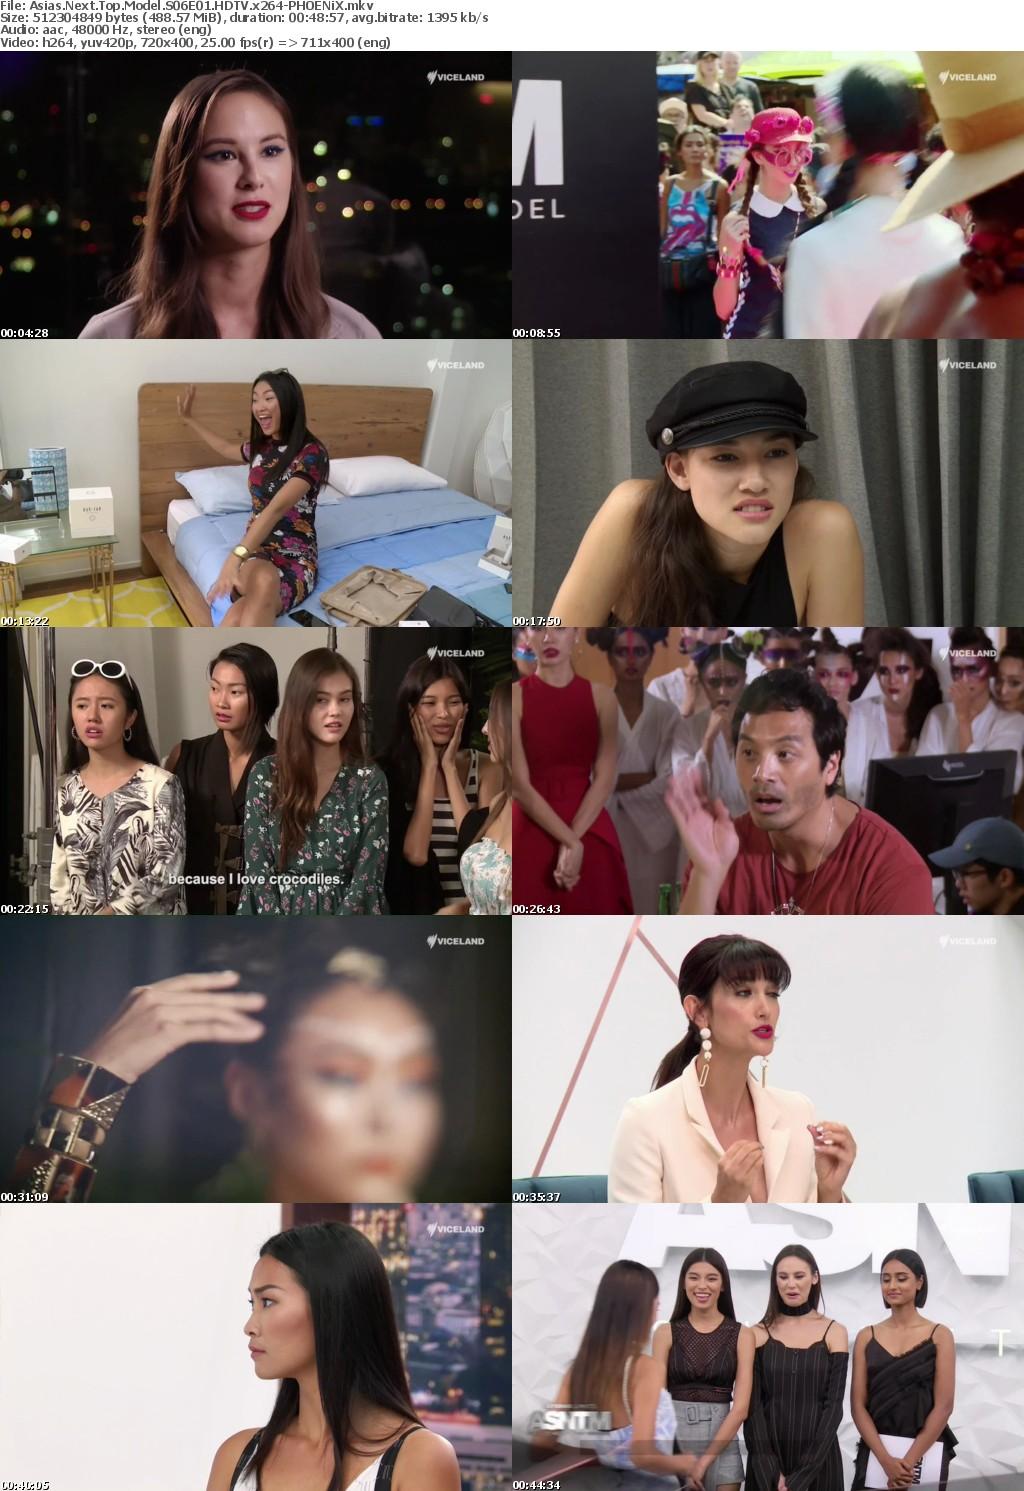 Asias Next Top Model S06E01 HDTV x264-PHOENiX